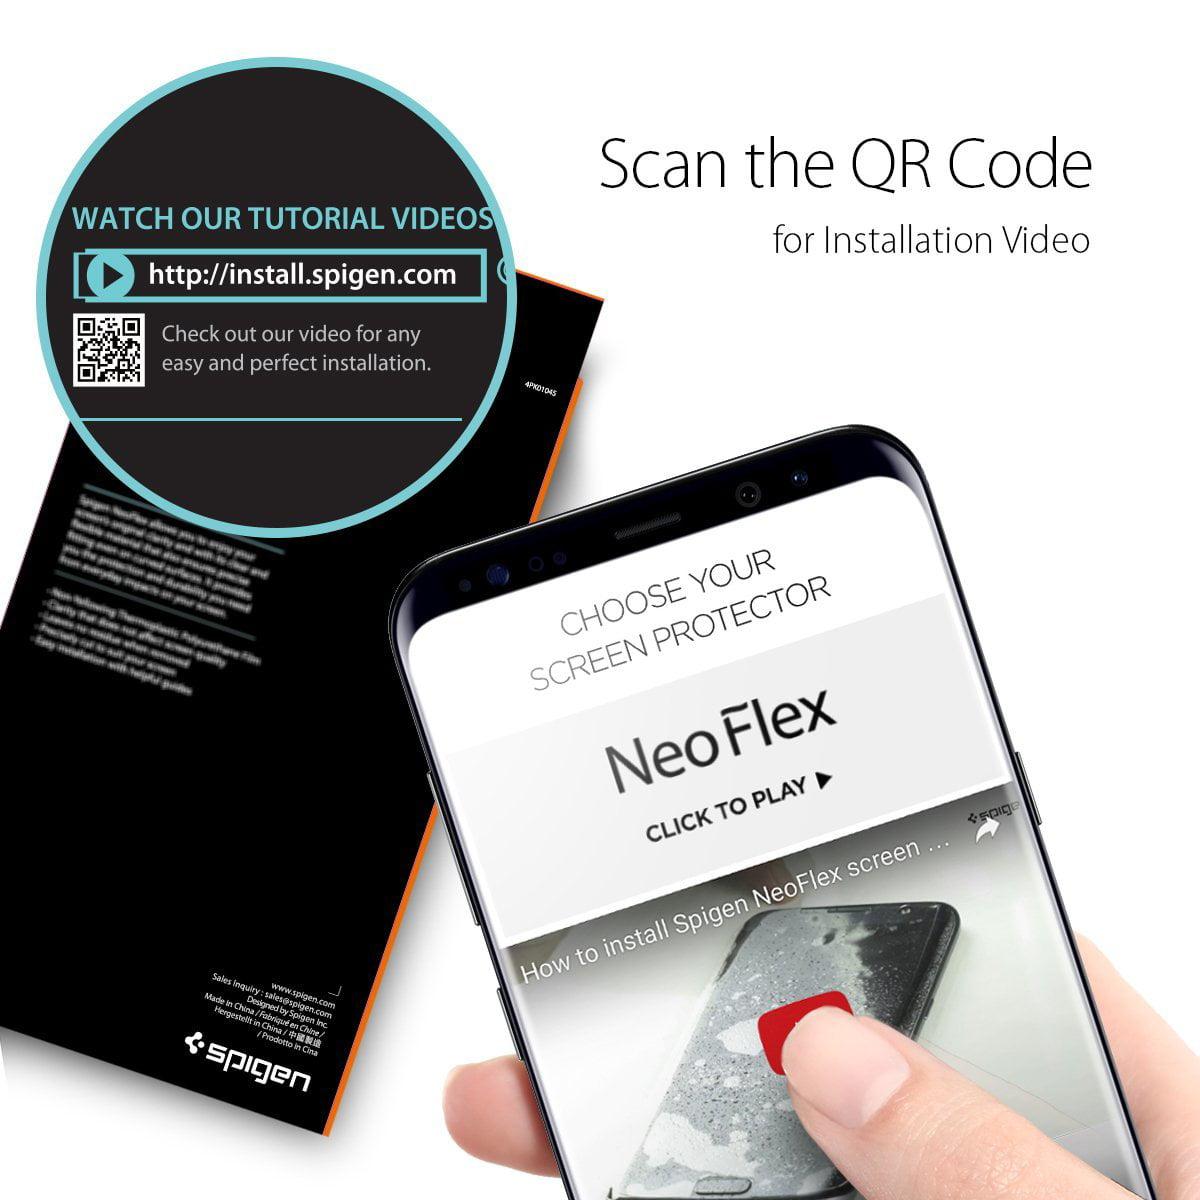 online retailer ba5a2 d415e Spigen Galaxy S8 Plus Screen Protector NeoFlex / 2 Pack / Flexible Film /  Case Friendly for Samsung Galaxy S8+